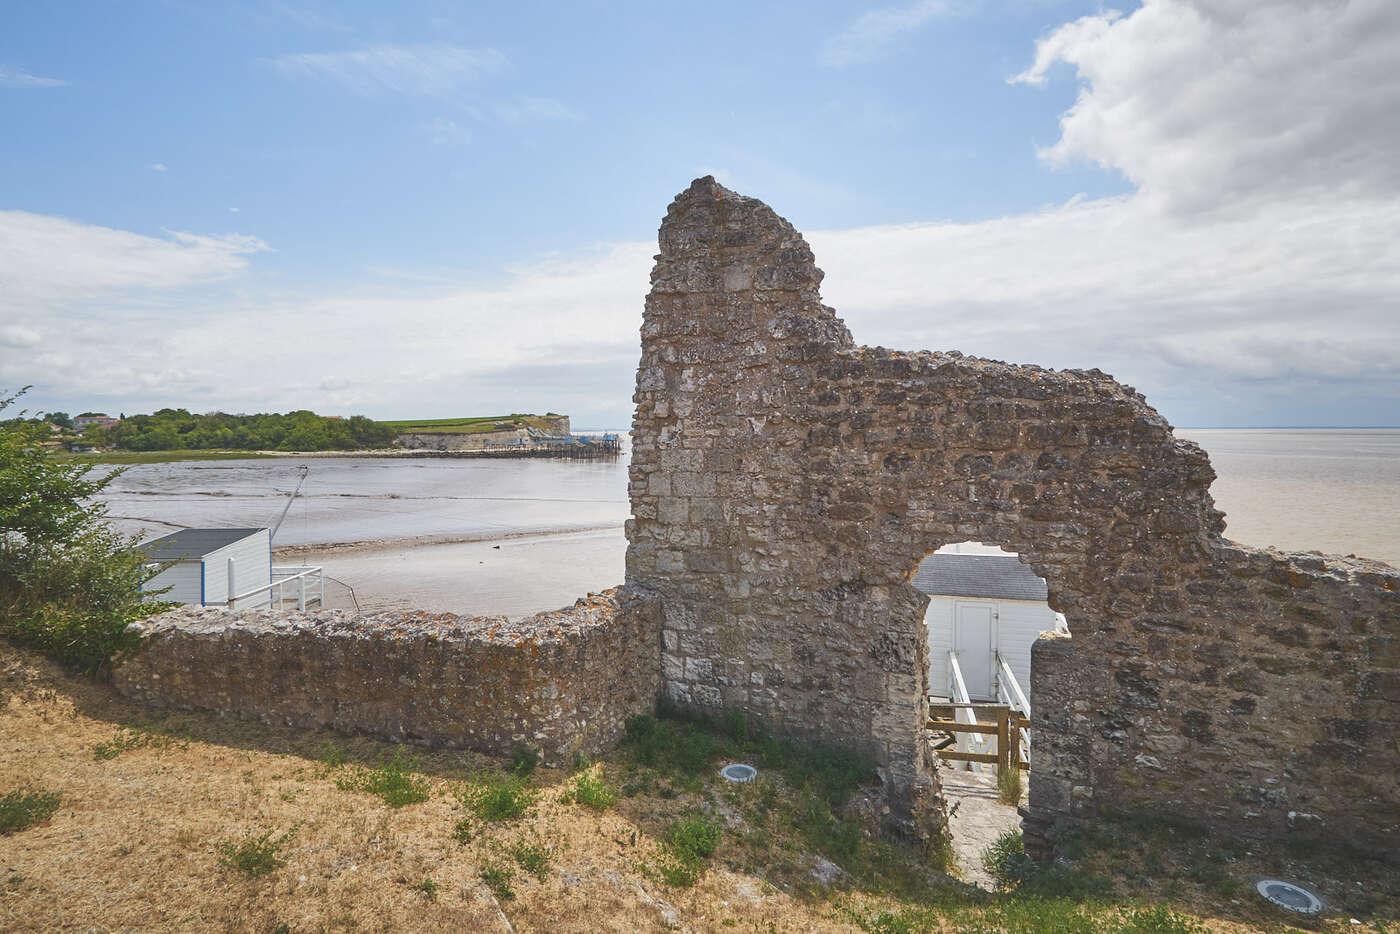 Tour Blanche de Talmont-sur-Gironde